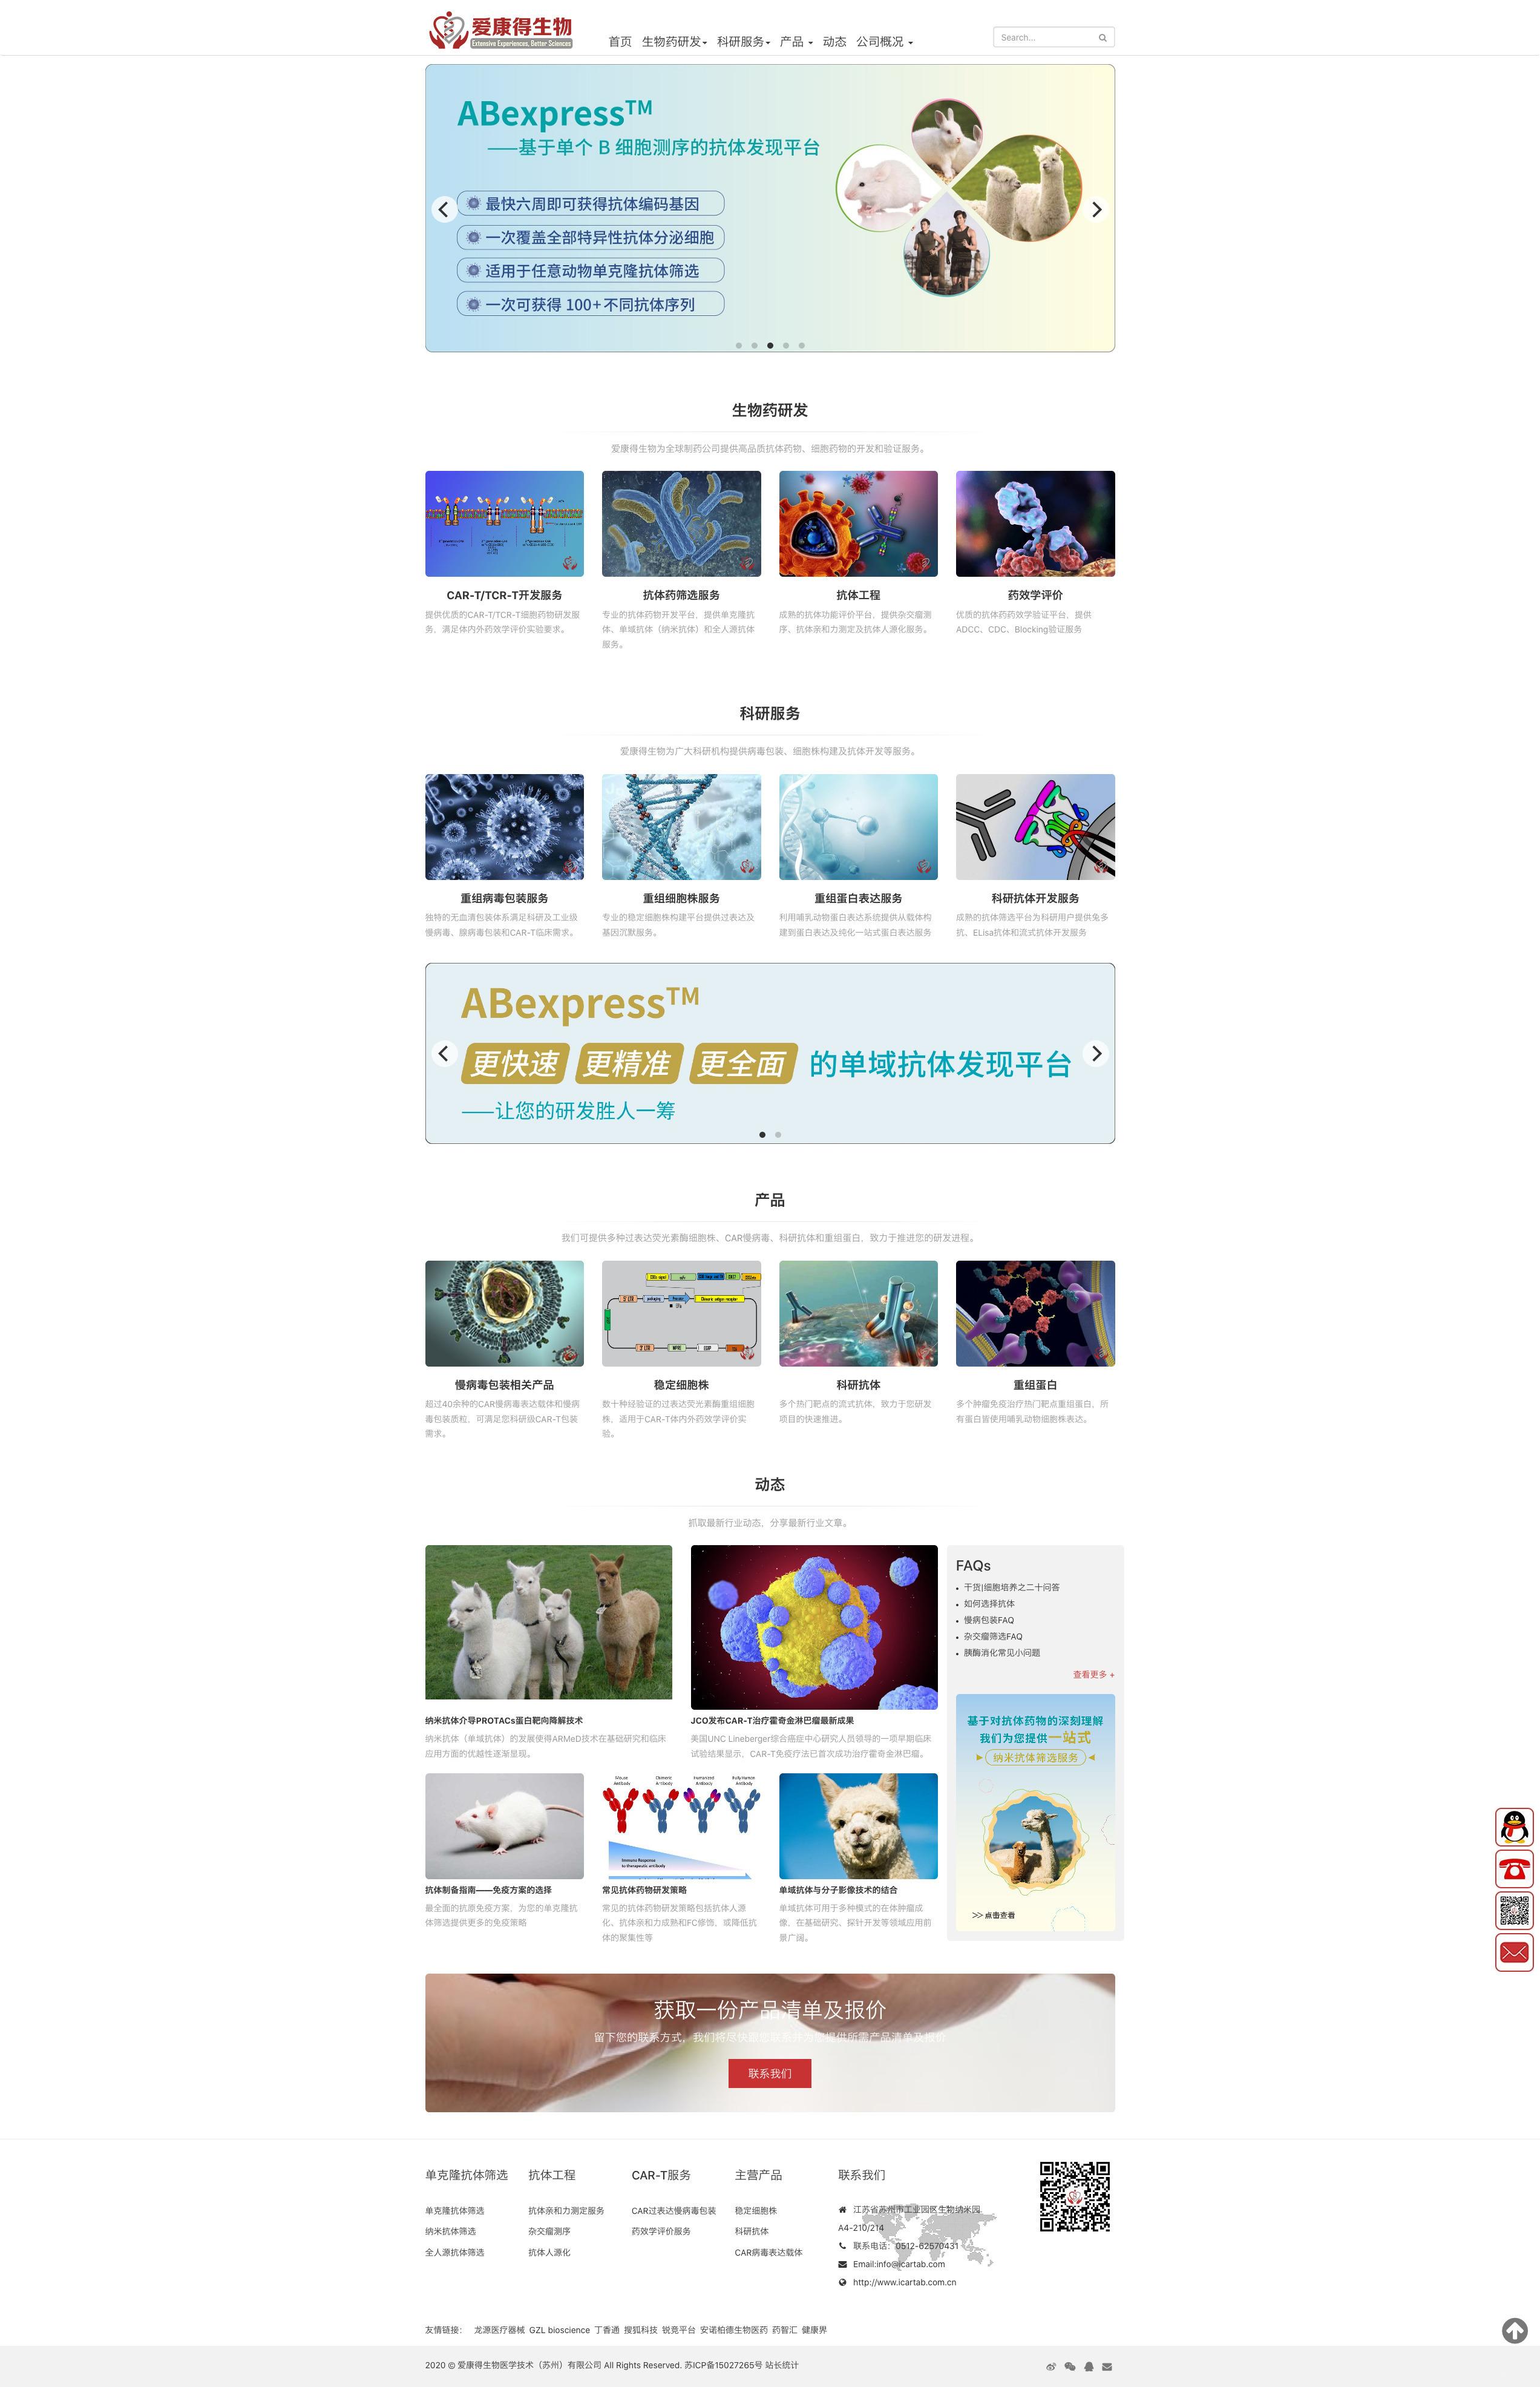 Screenshot_2020-08-24 爱康得生物医学技术(苏州)有限公司纳米抗体及CAR-T技术提供商 爱康得生物医学技术(苏州)有限公司(2).jpg